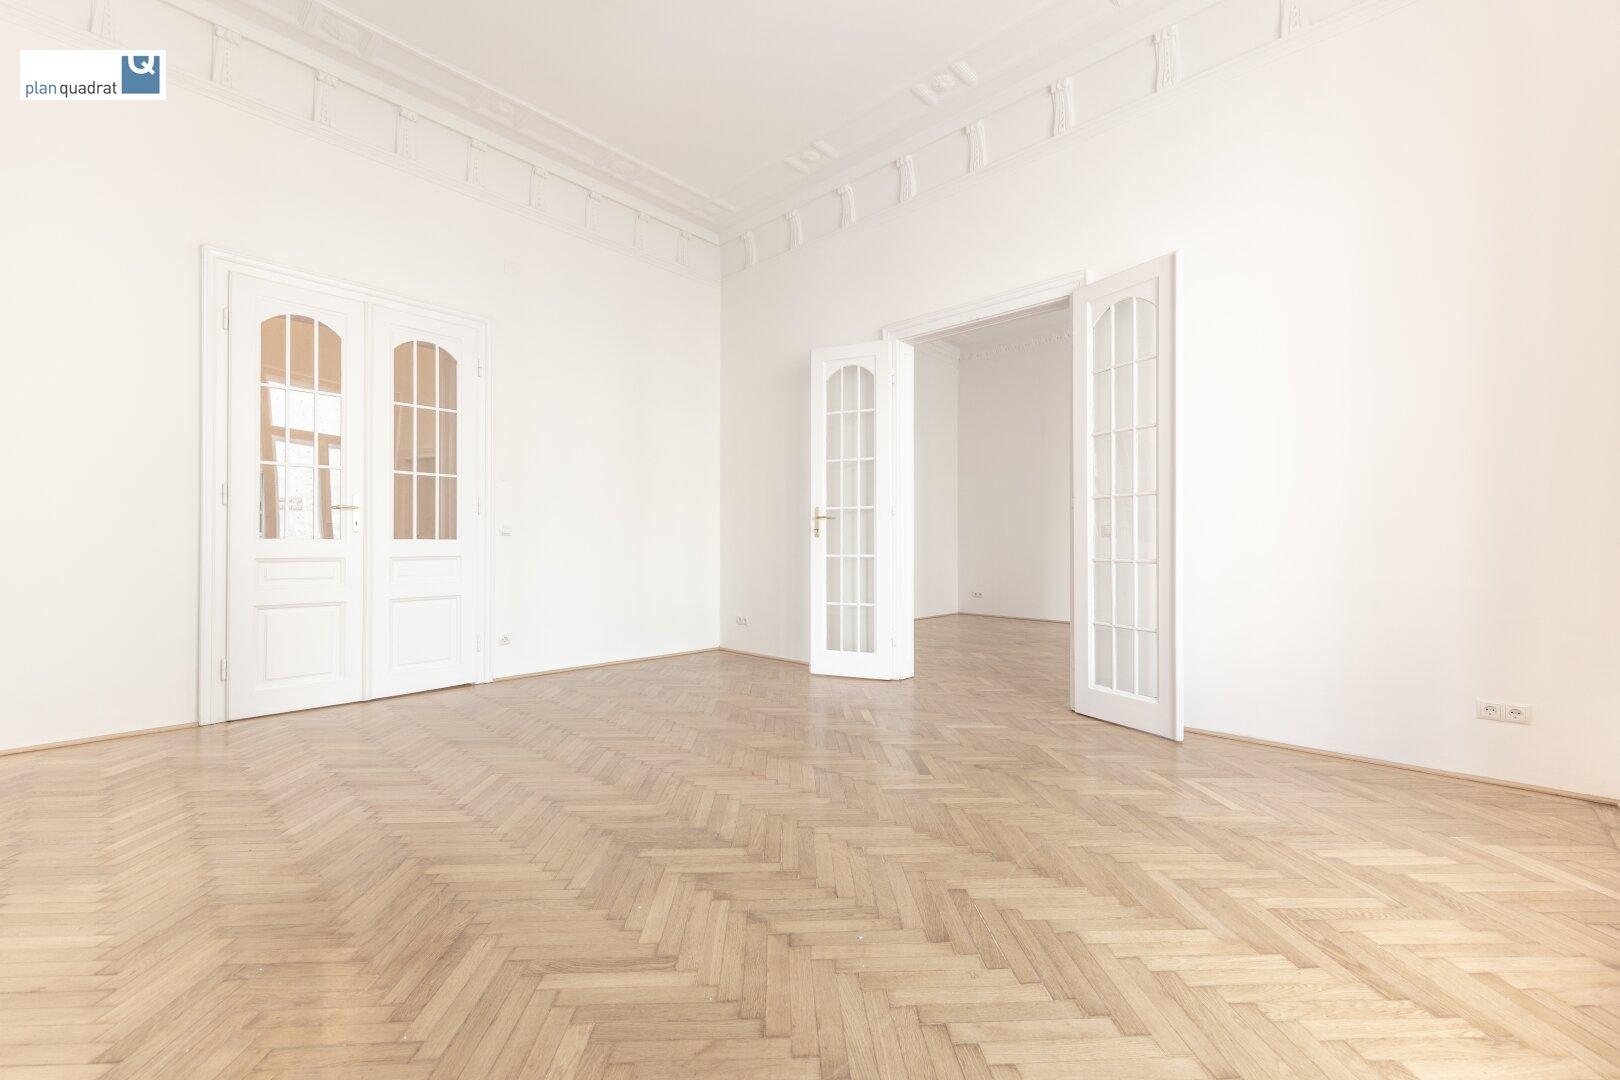 Raum 4 (gem. Grunsrissskizze - ca. 24,20 qm)